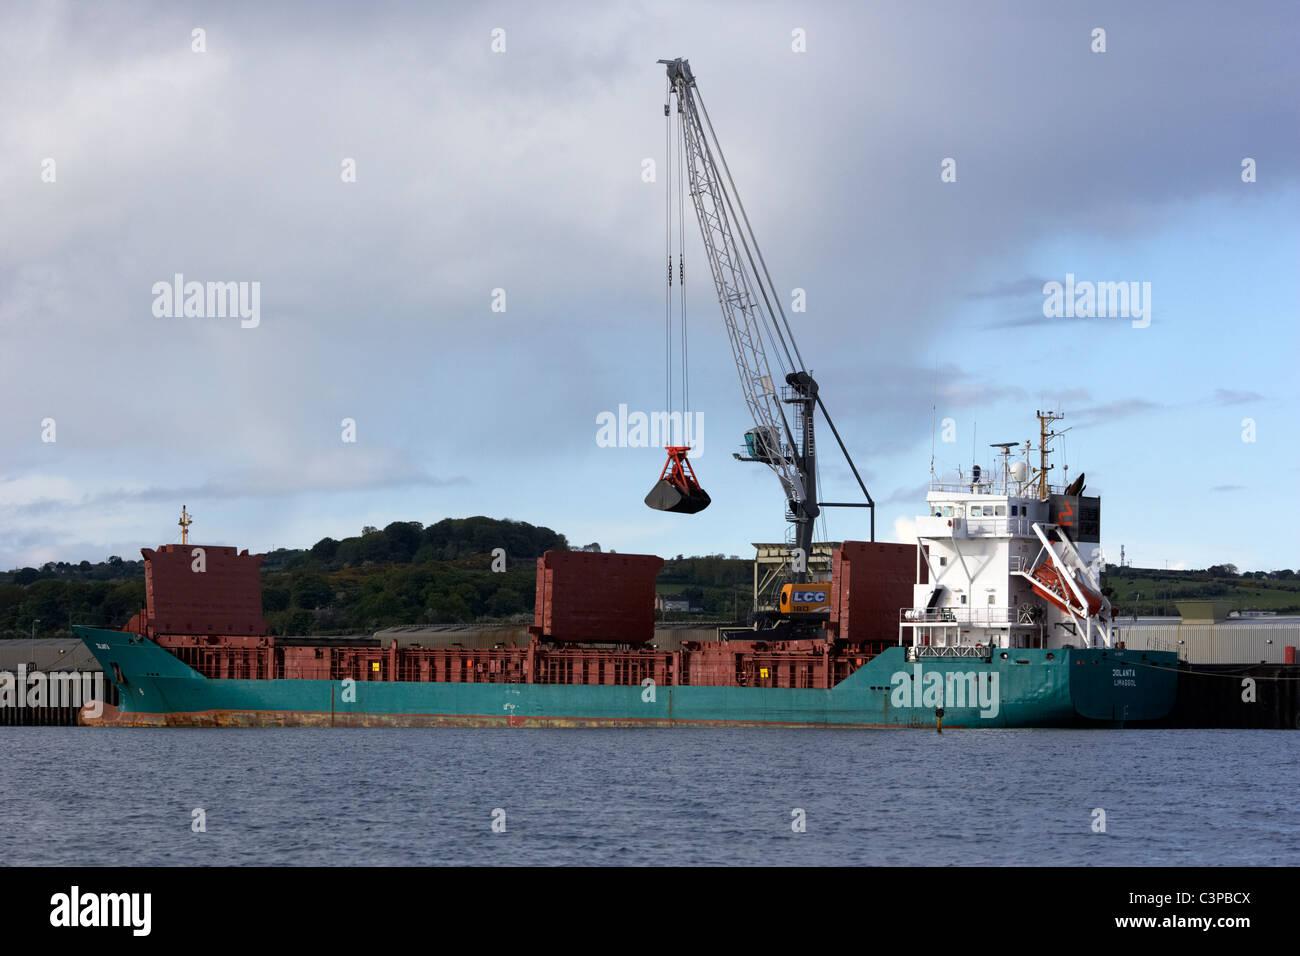 unloading power station coal from the jolanta general cargo ship at jetty at kilroot power station carrickfergus - Stock Image